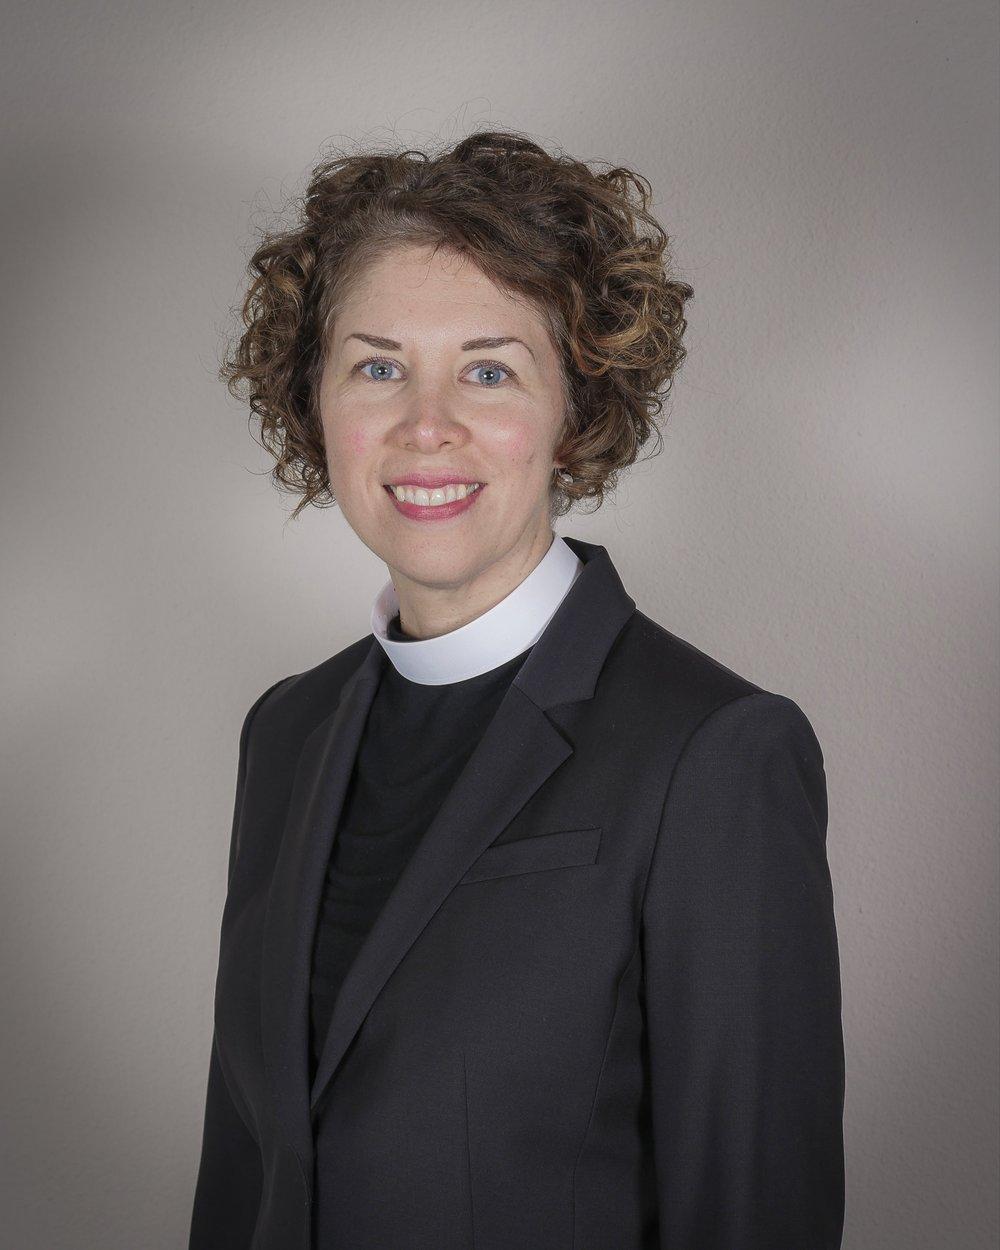 Pastor Katy print 2.jpg